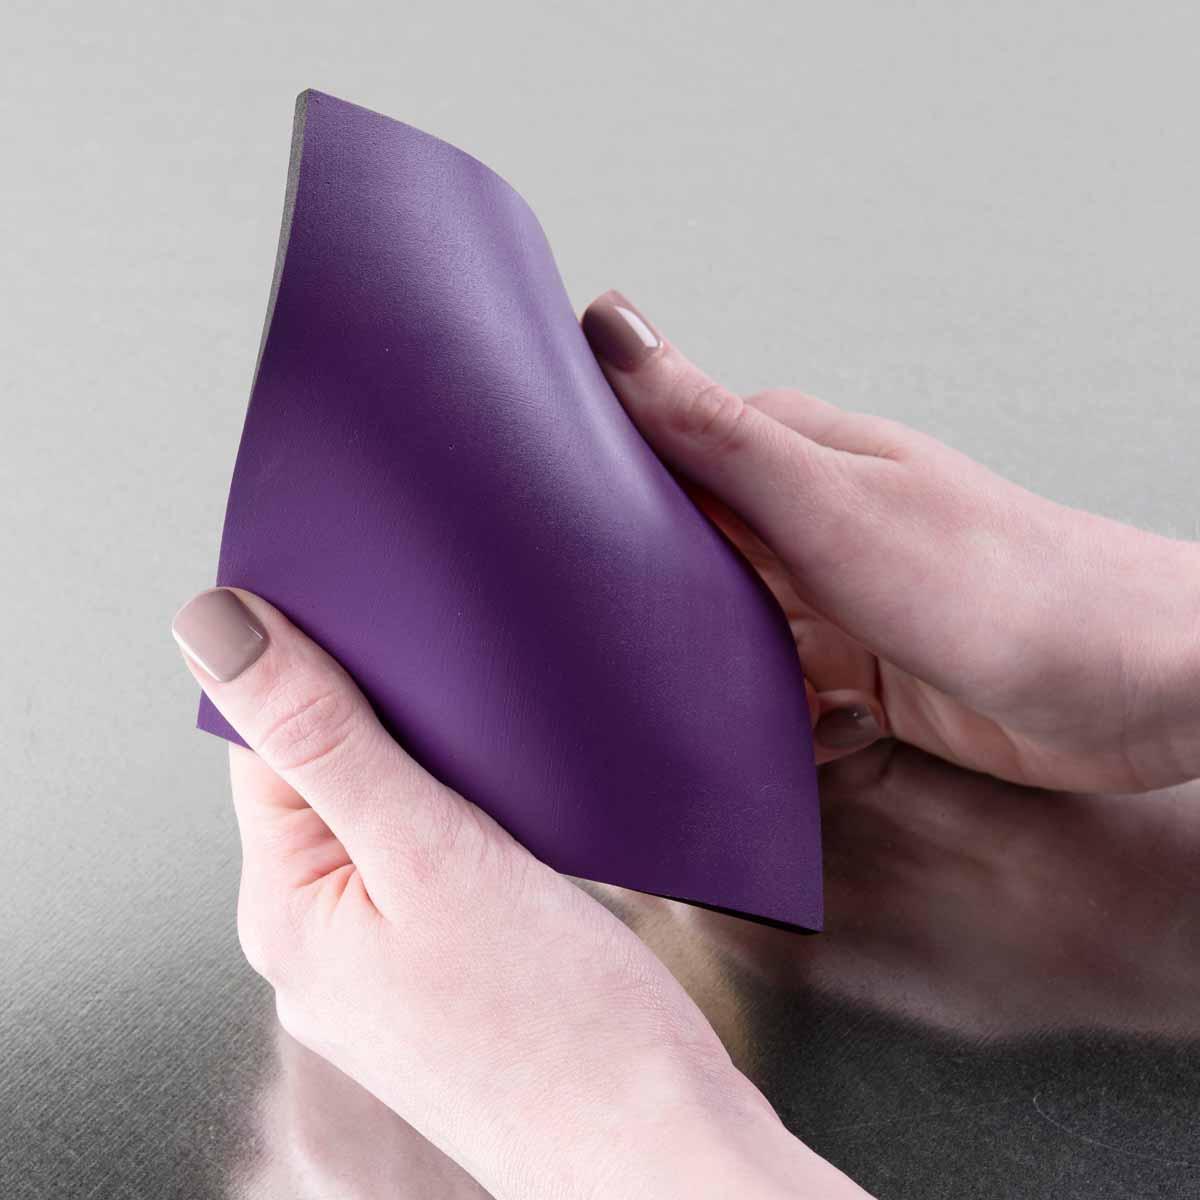 PlaidFX Smooth Satin Flexible Acrylic Paint - Aquarius, 3 oz. - 36859